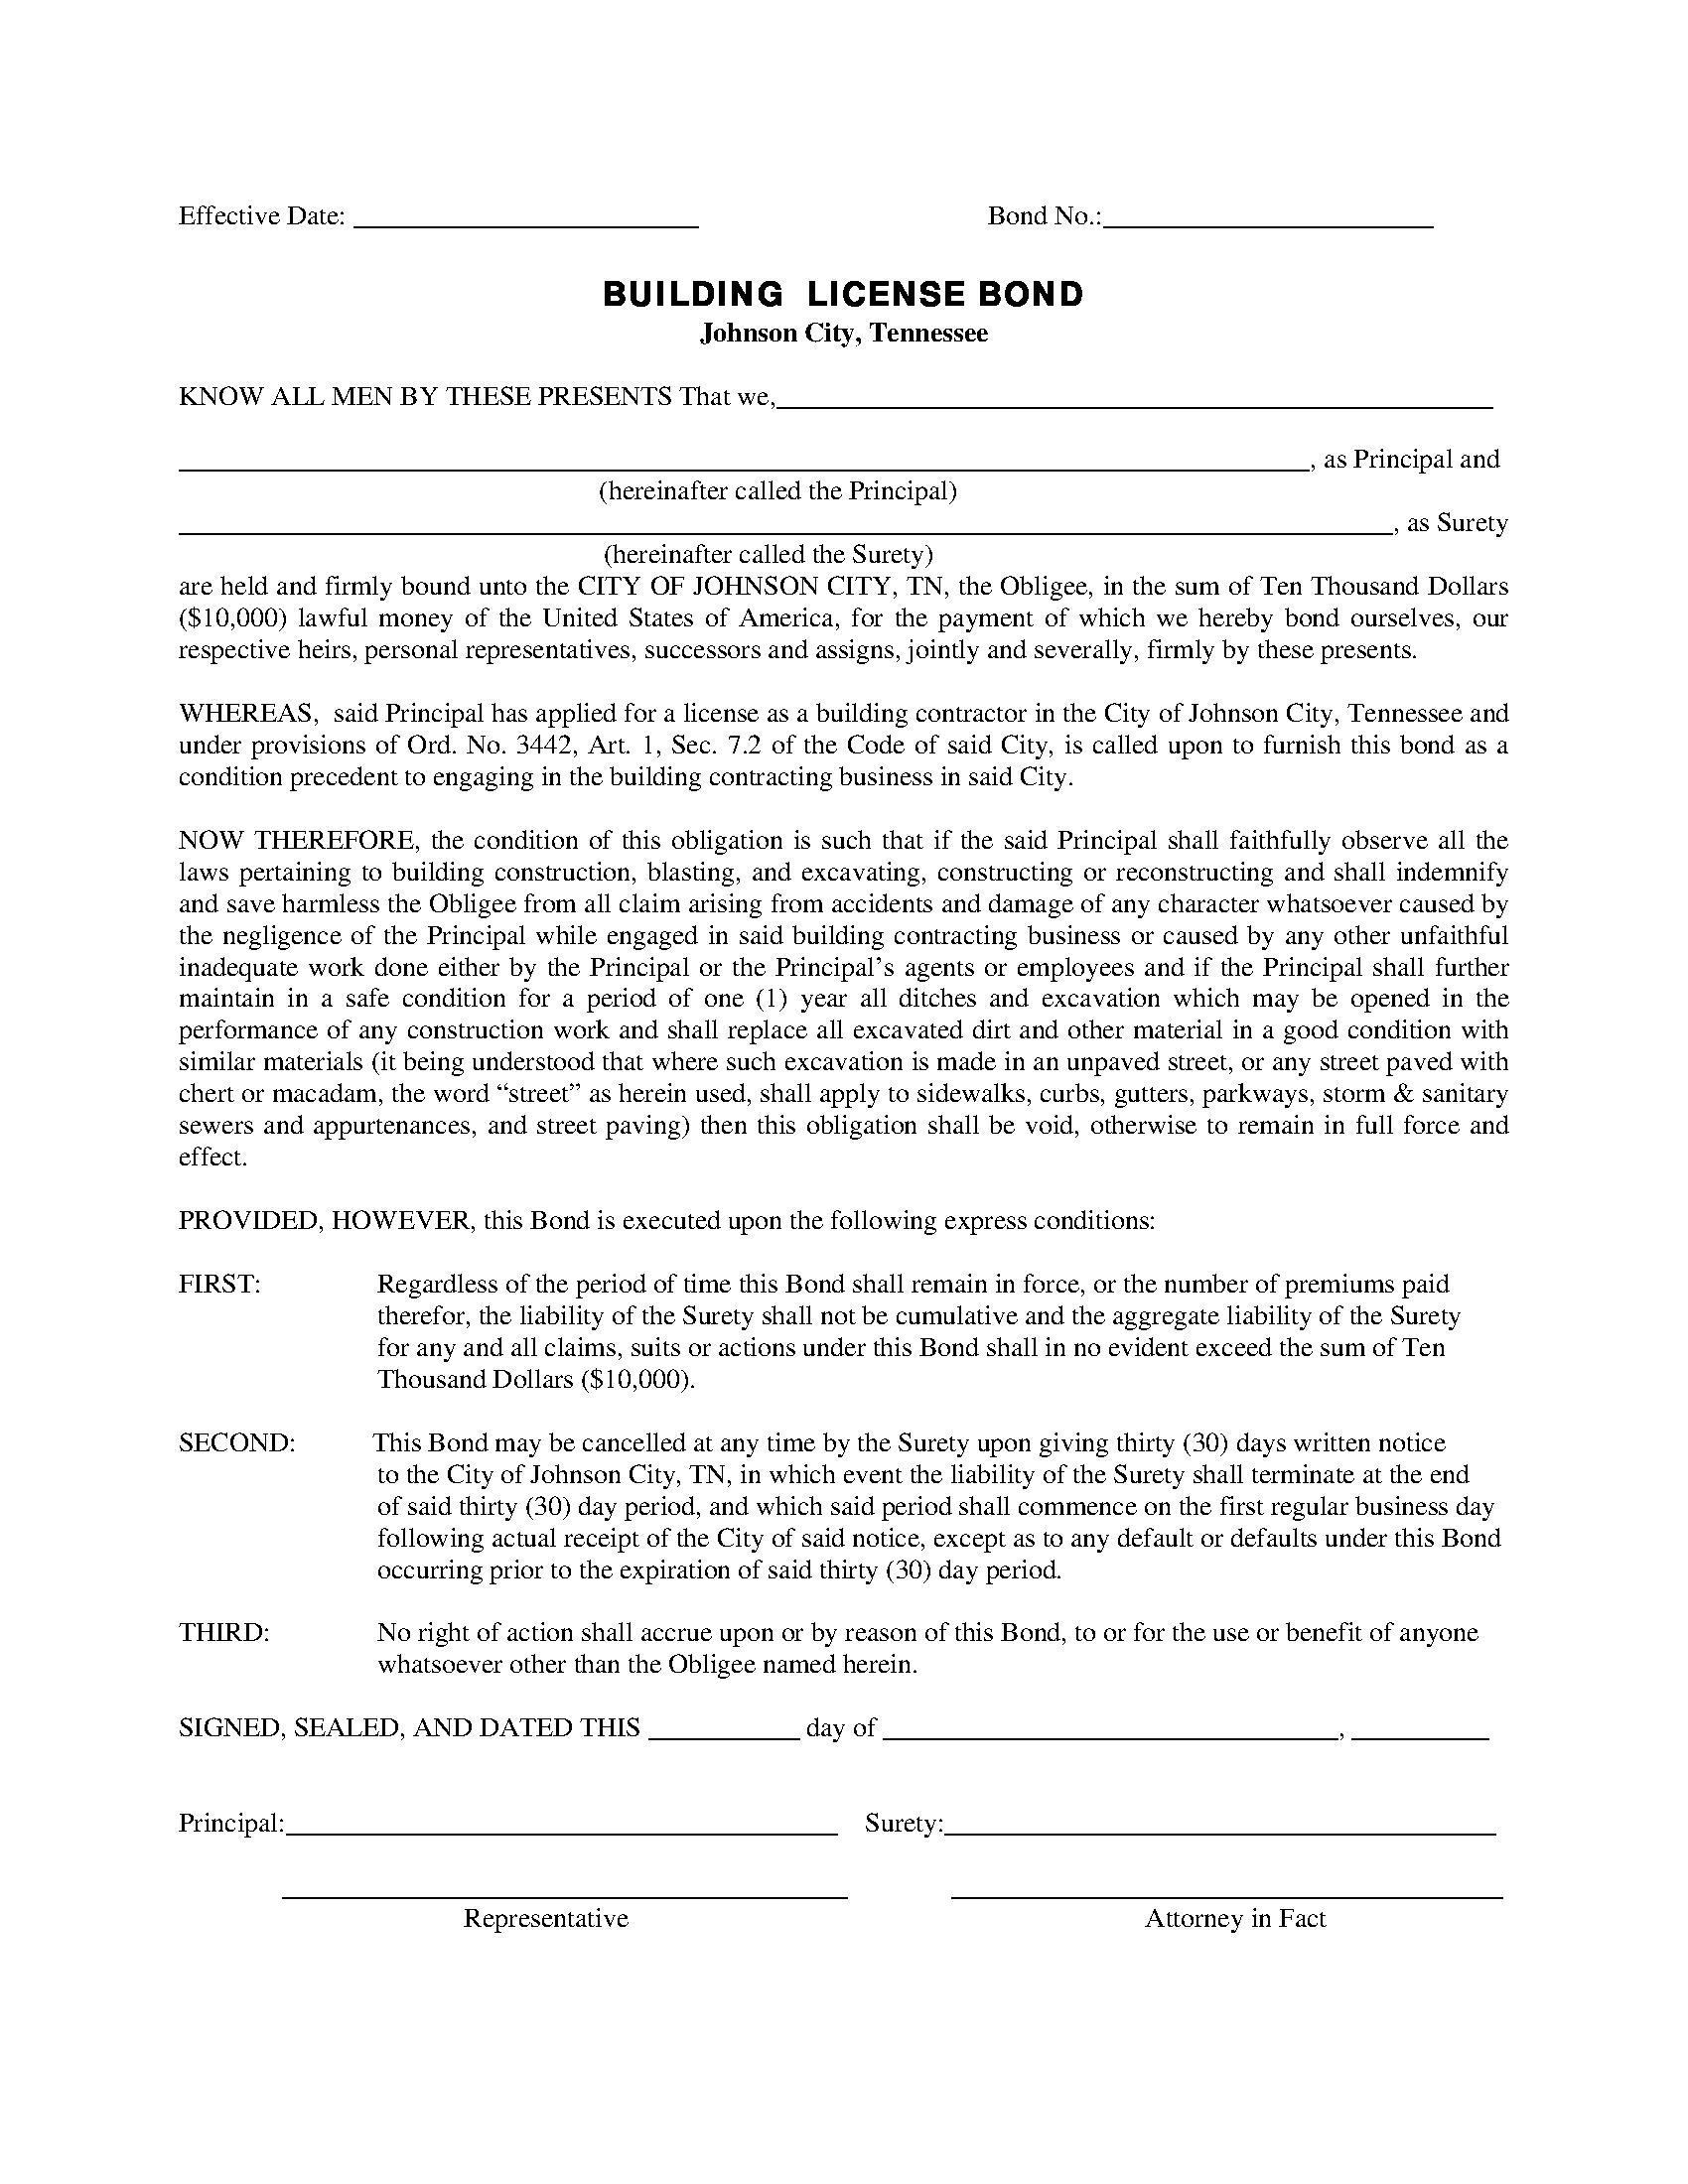 City of Johnson City Building License sample image